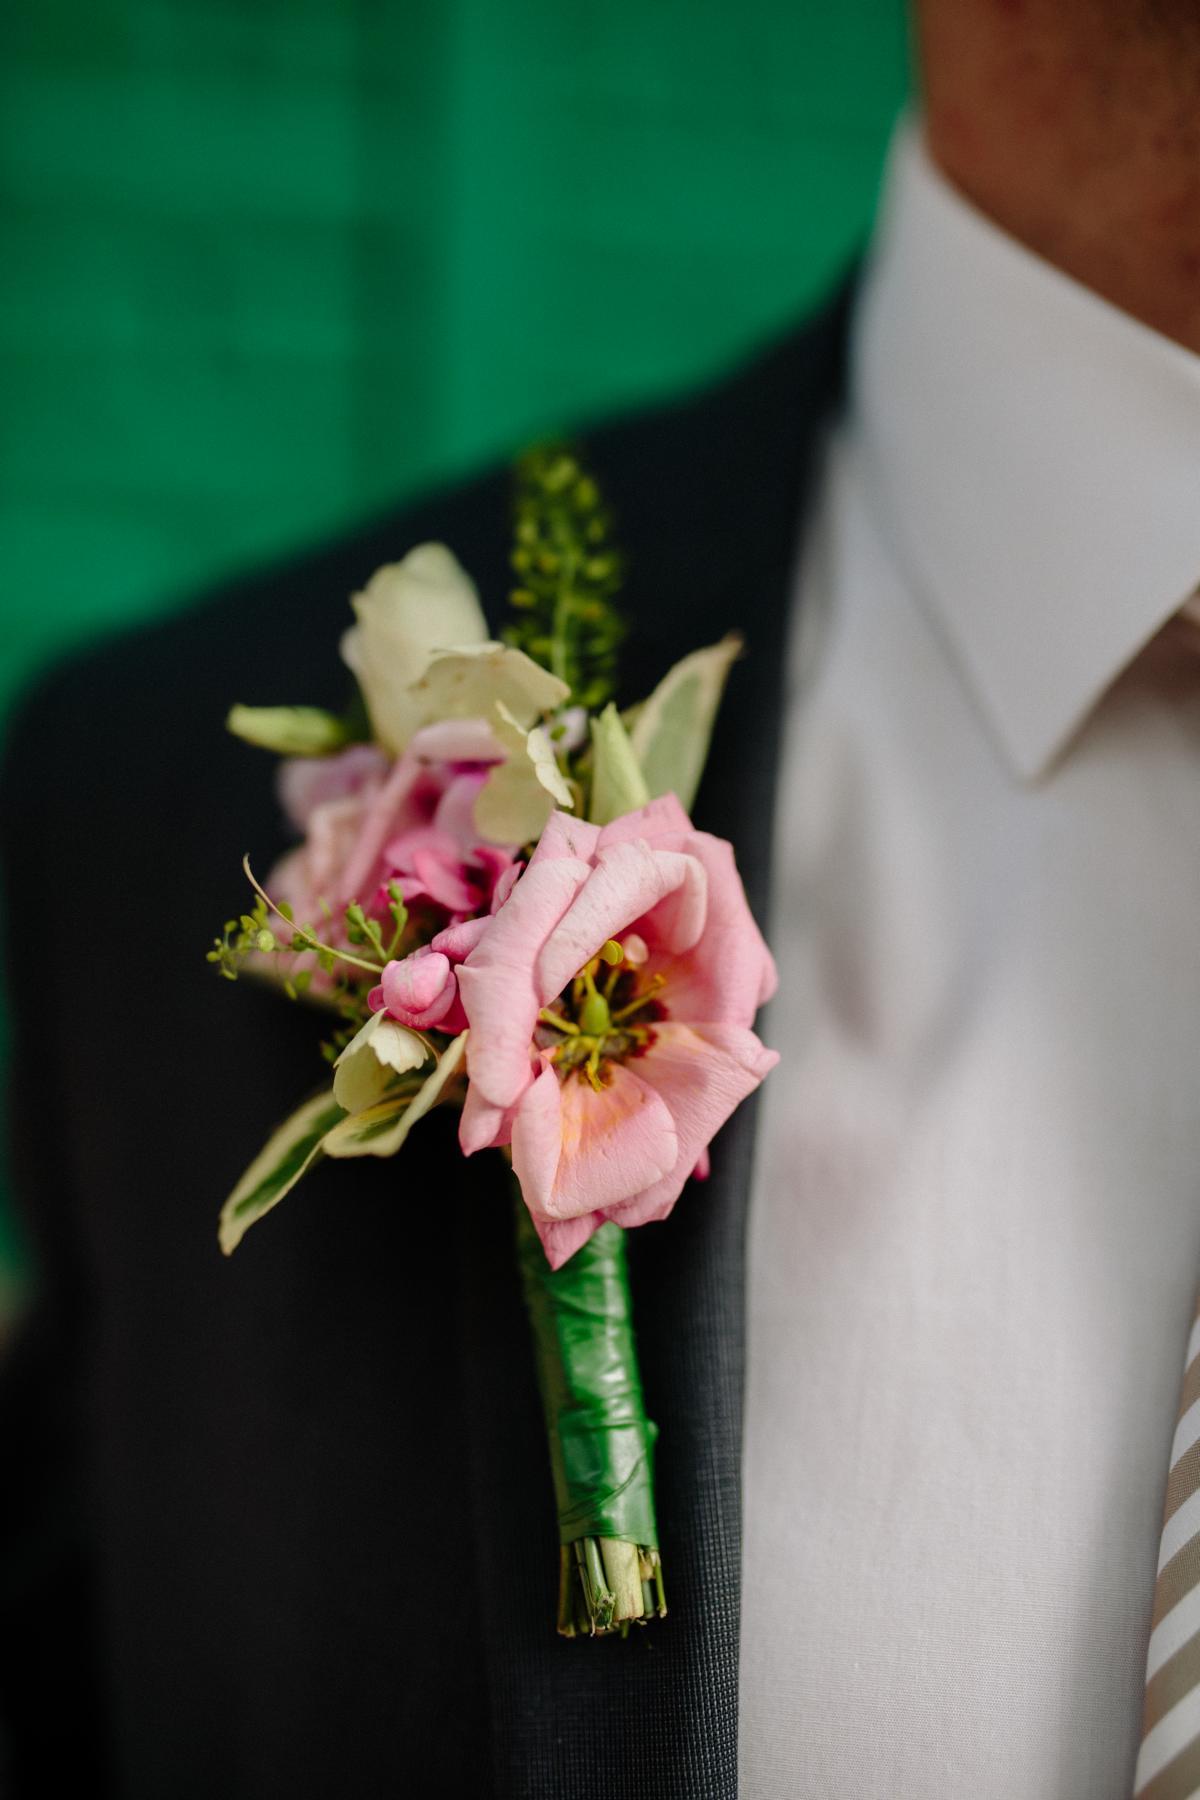 Schmuck am Anzug des Bräutigams